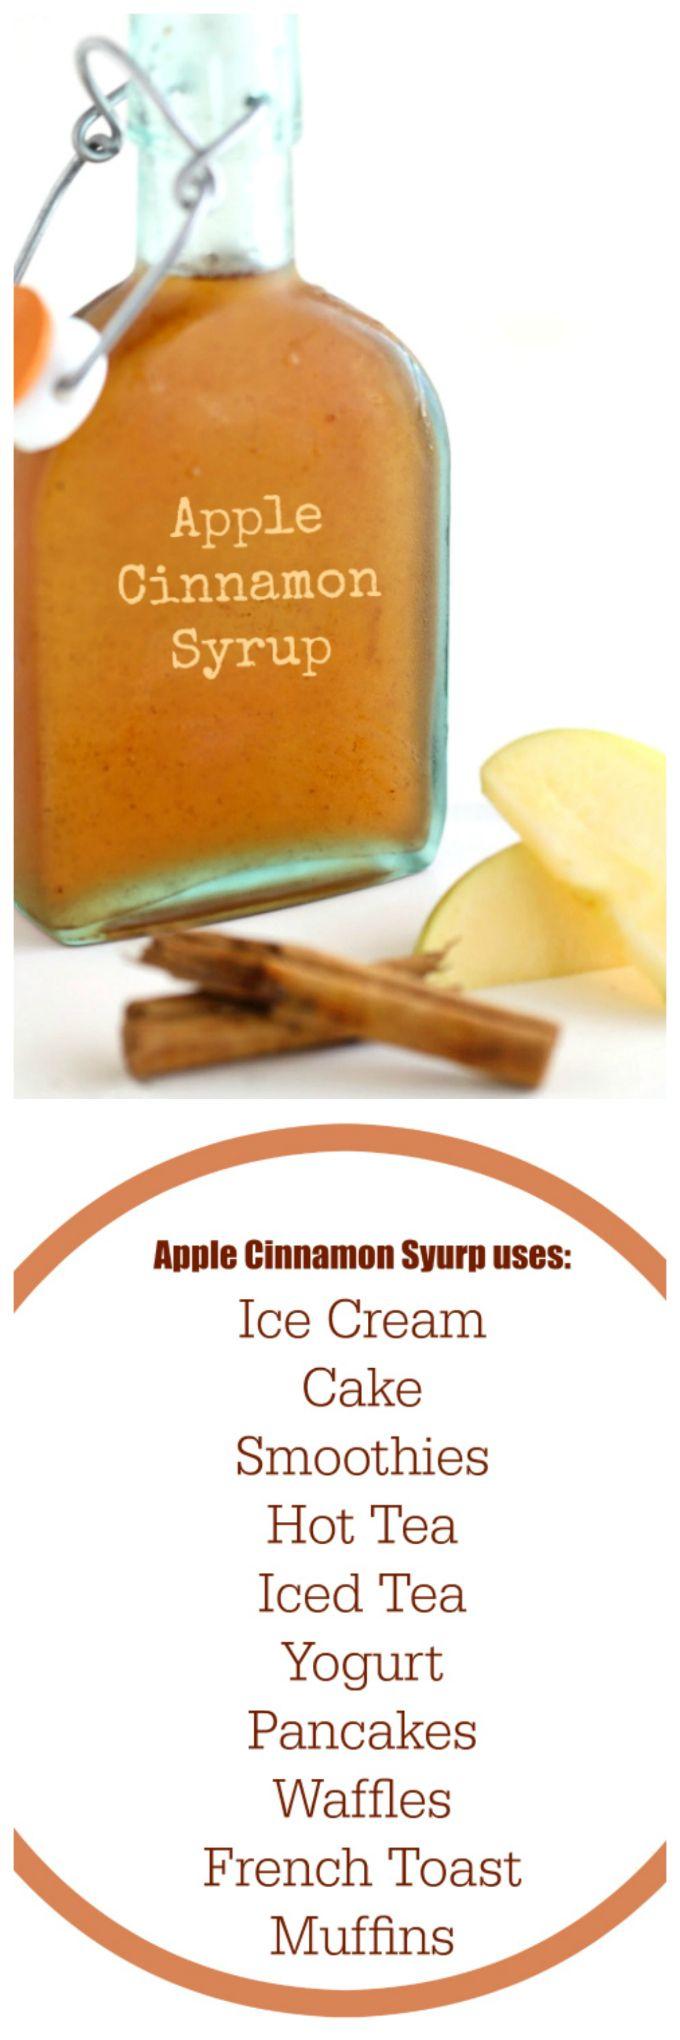 apple-cinnamon-syrup-and-its-many-uses-createdbydiane